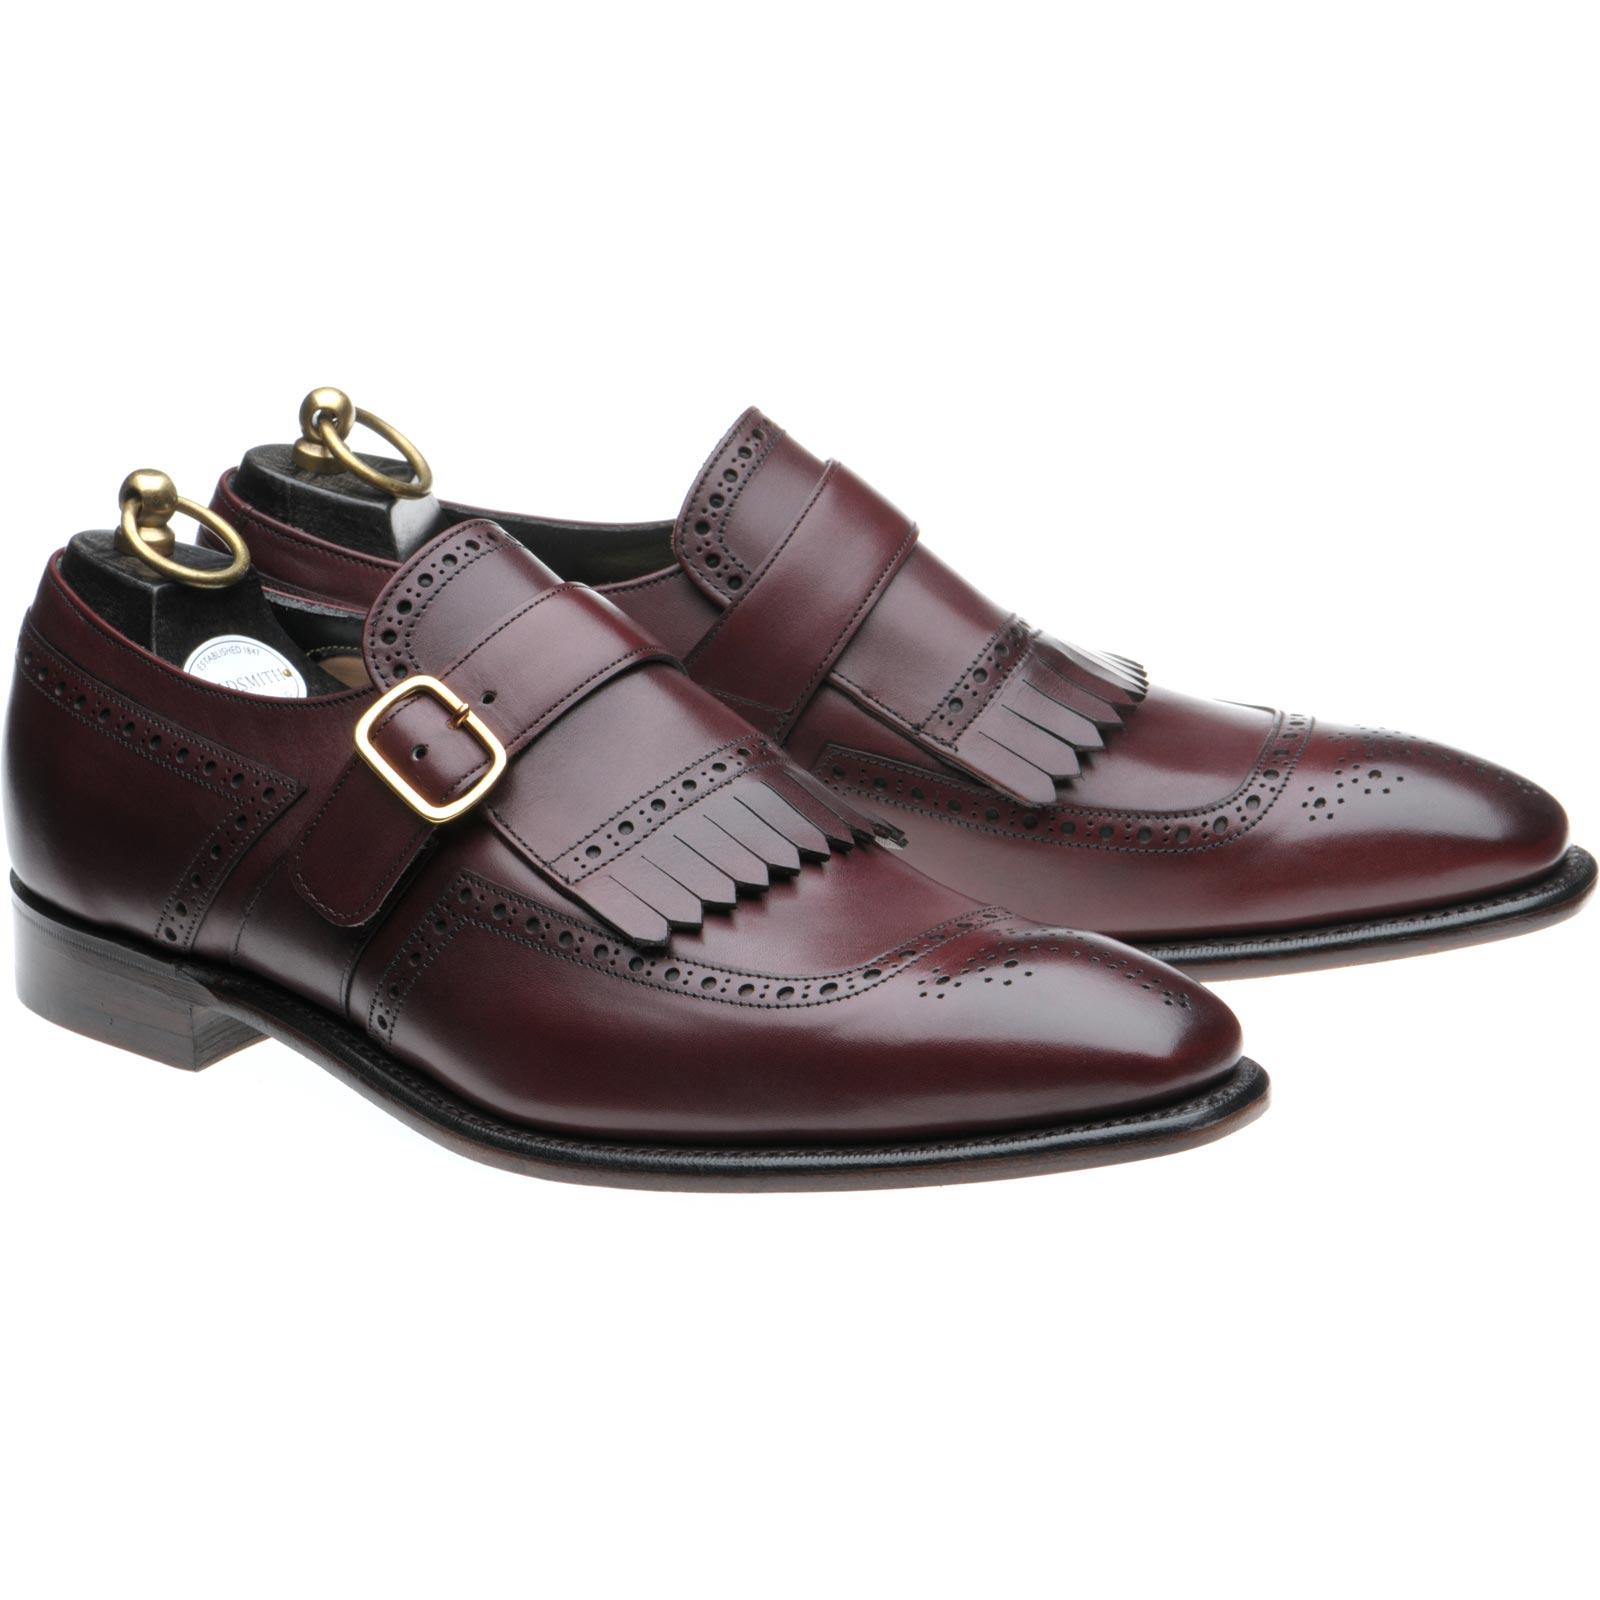 Wildsmith Faith monk shoes